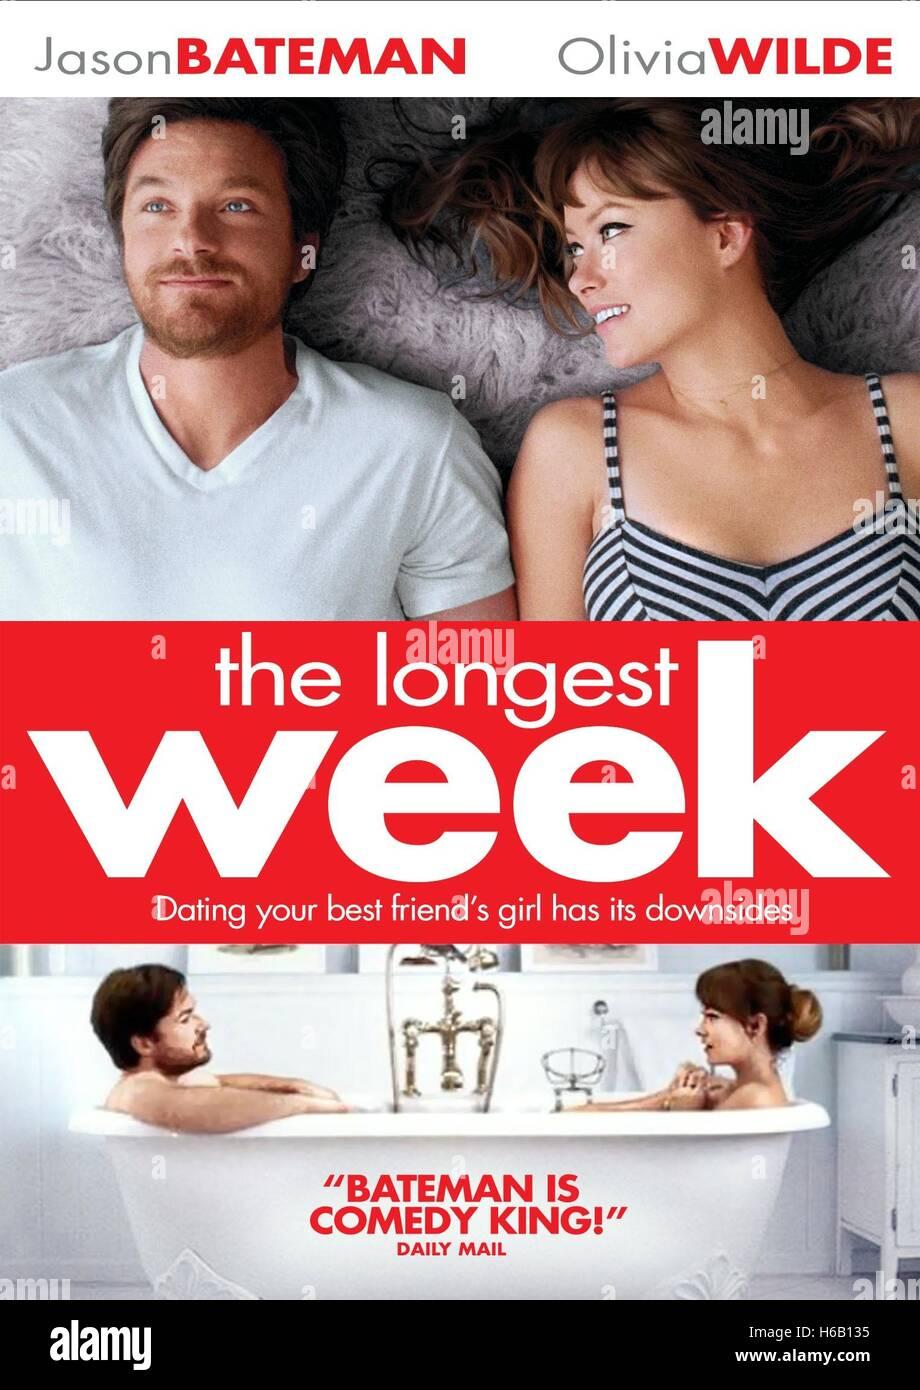 JASON BATEMAN & OLIVIA WILDE POSTER THE LONGEST WEEK (2014) - Stock Image